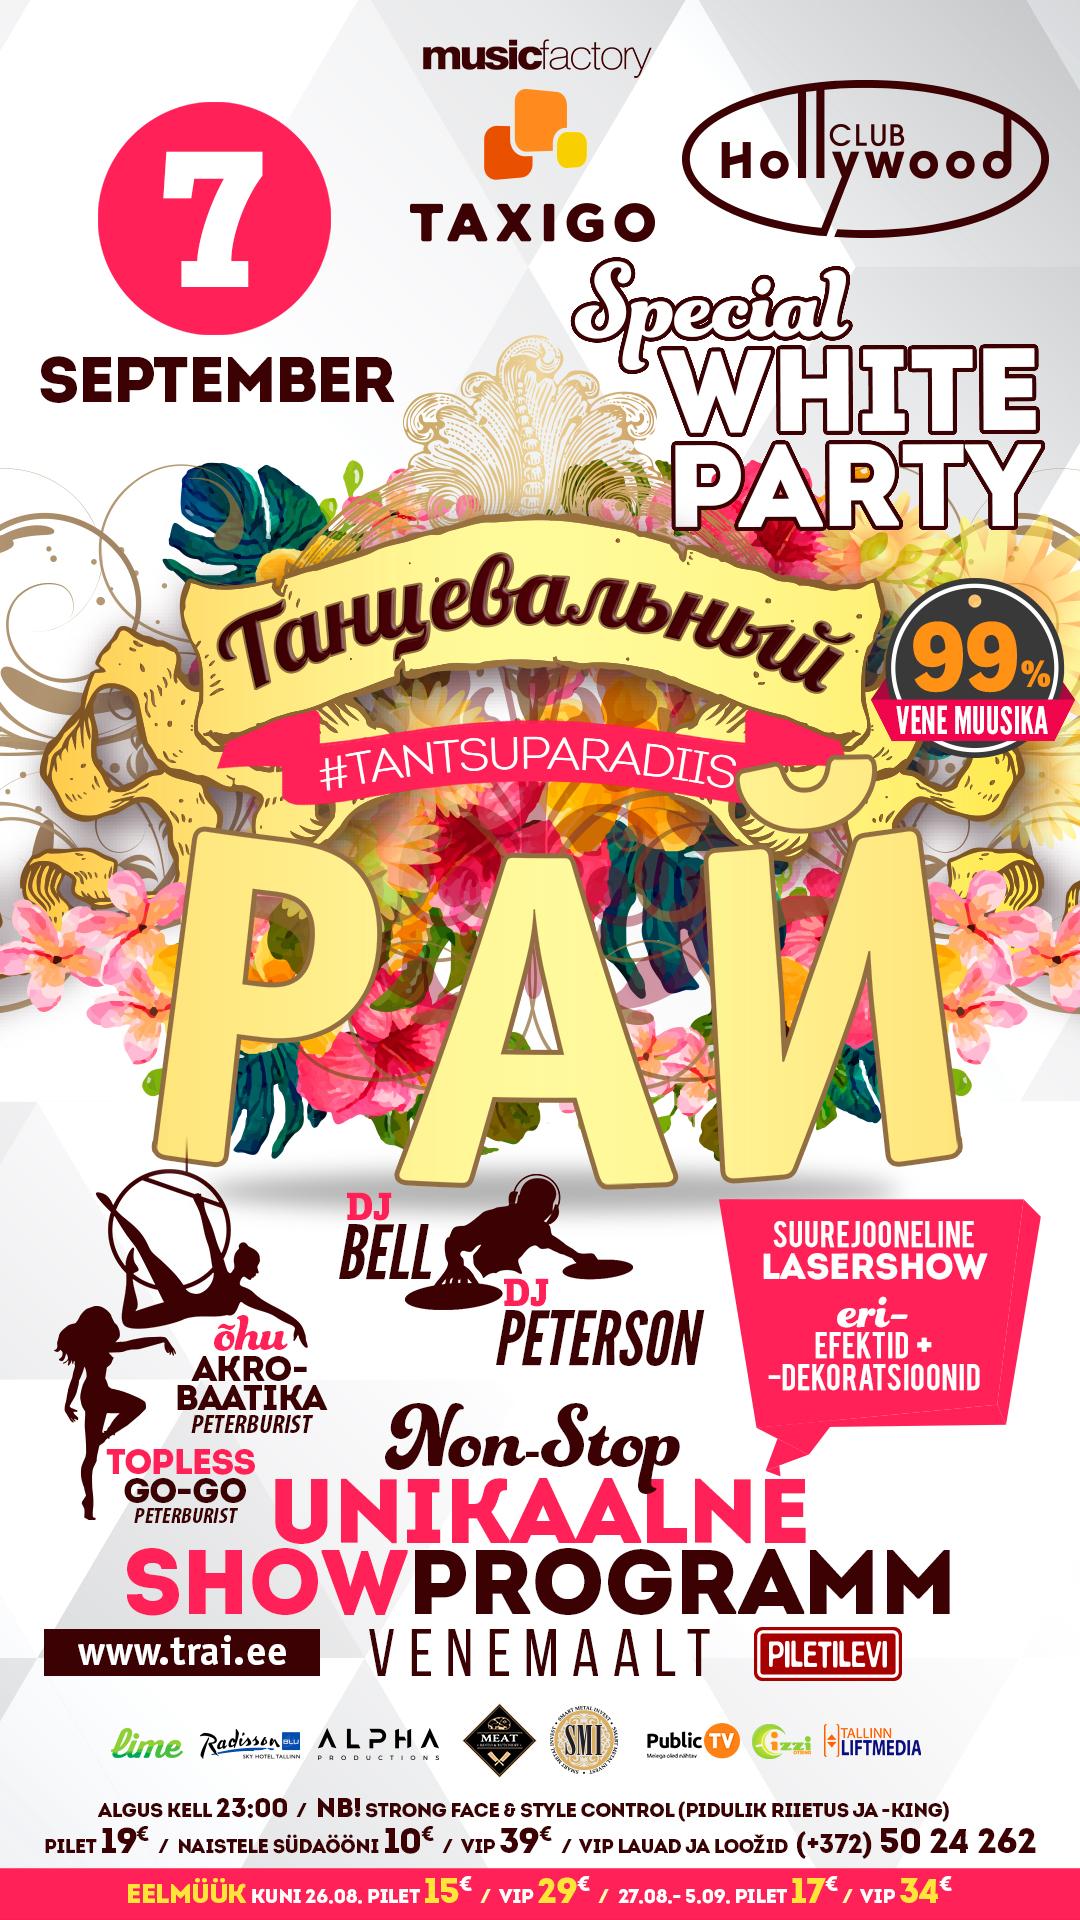 a6f8b17a08f Tantsuparadiis / Танцевальный Рай - special WHITE Party! – GateMe